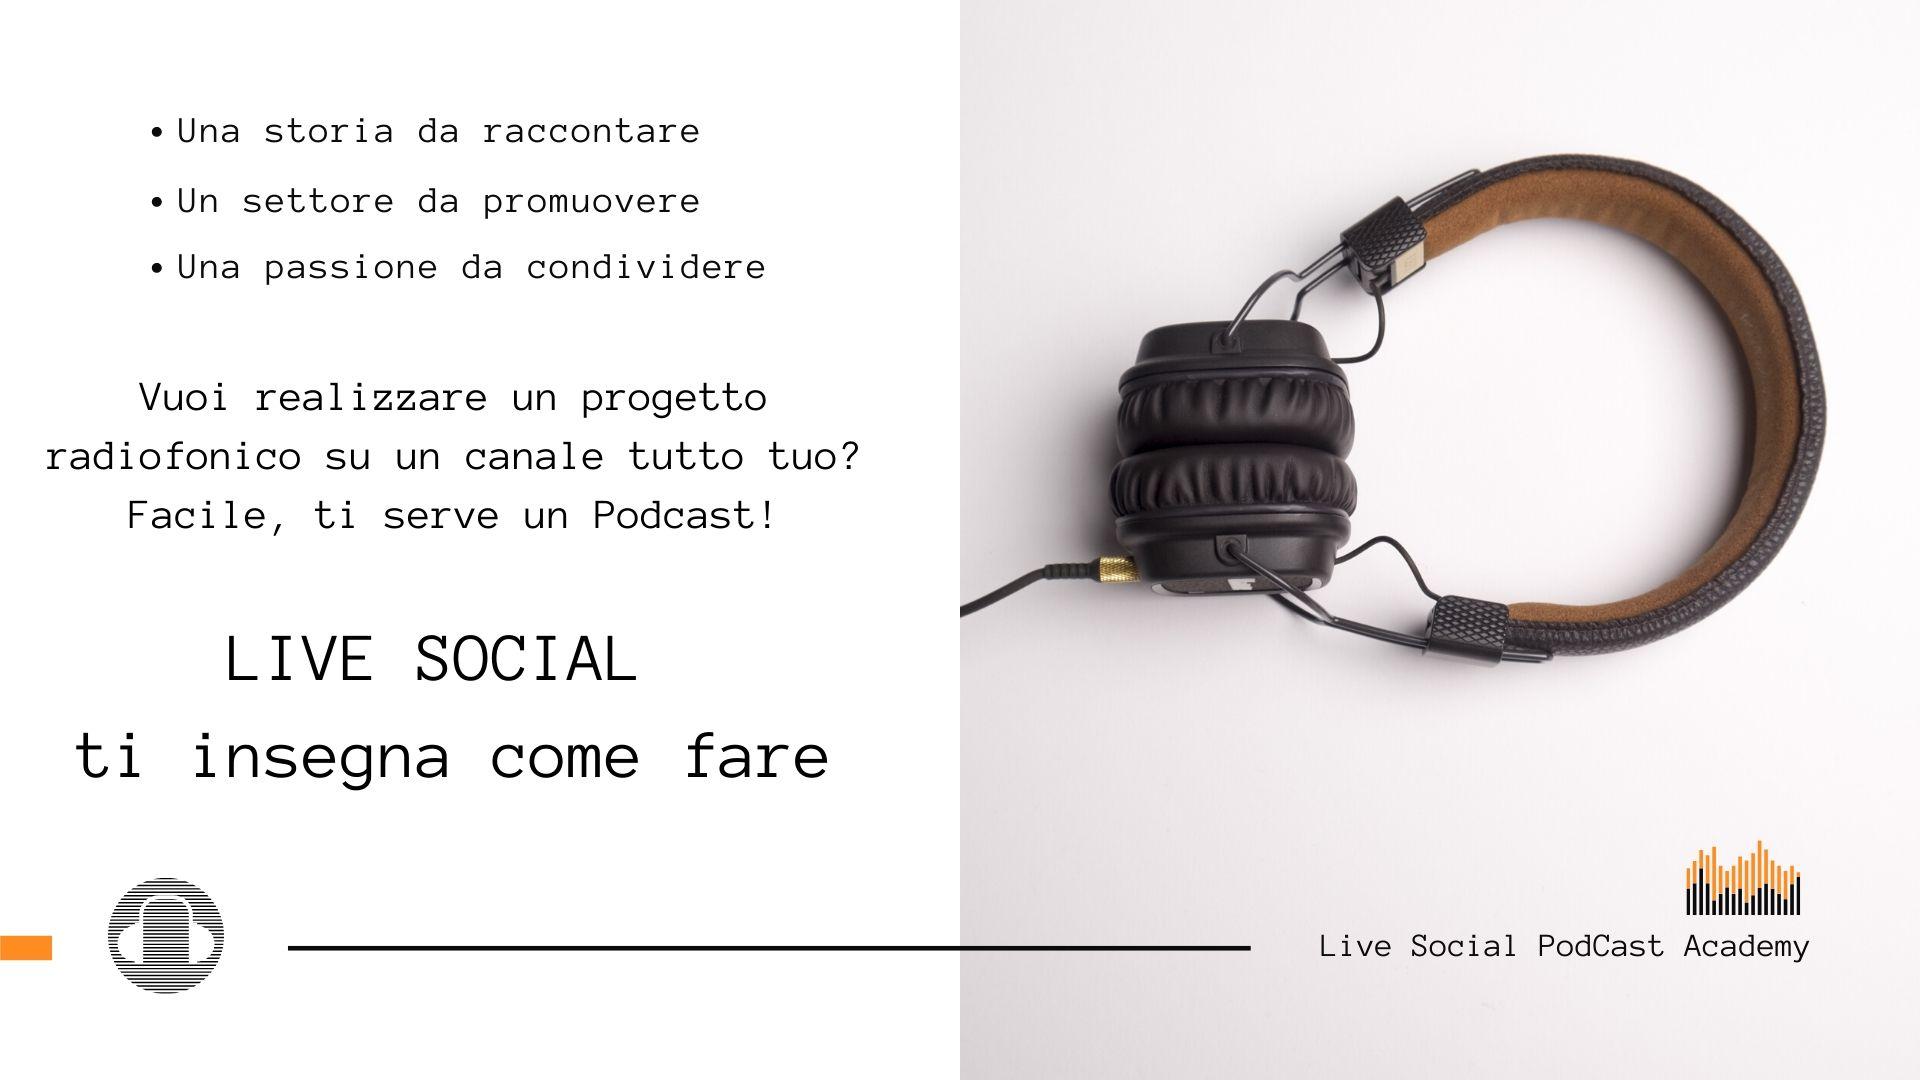 podcast academy live social